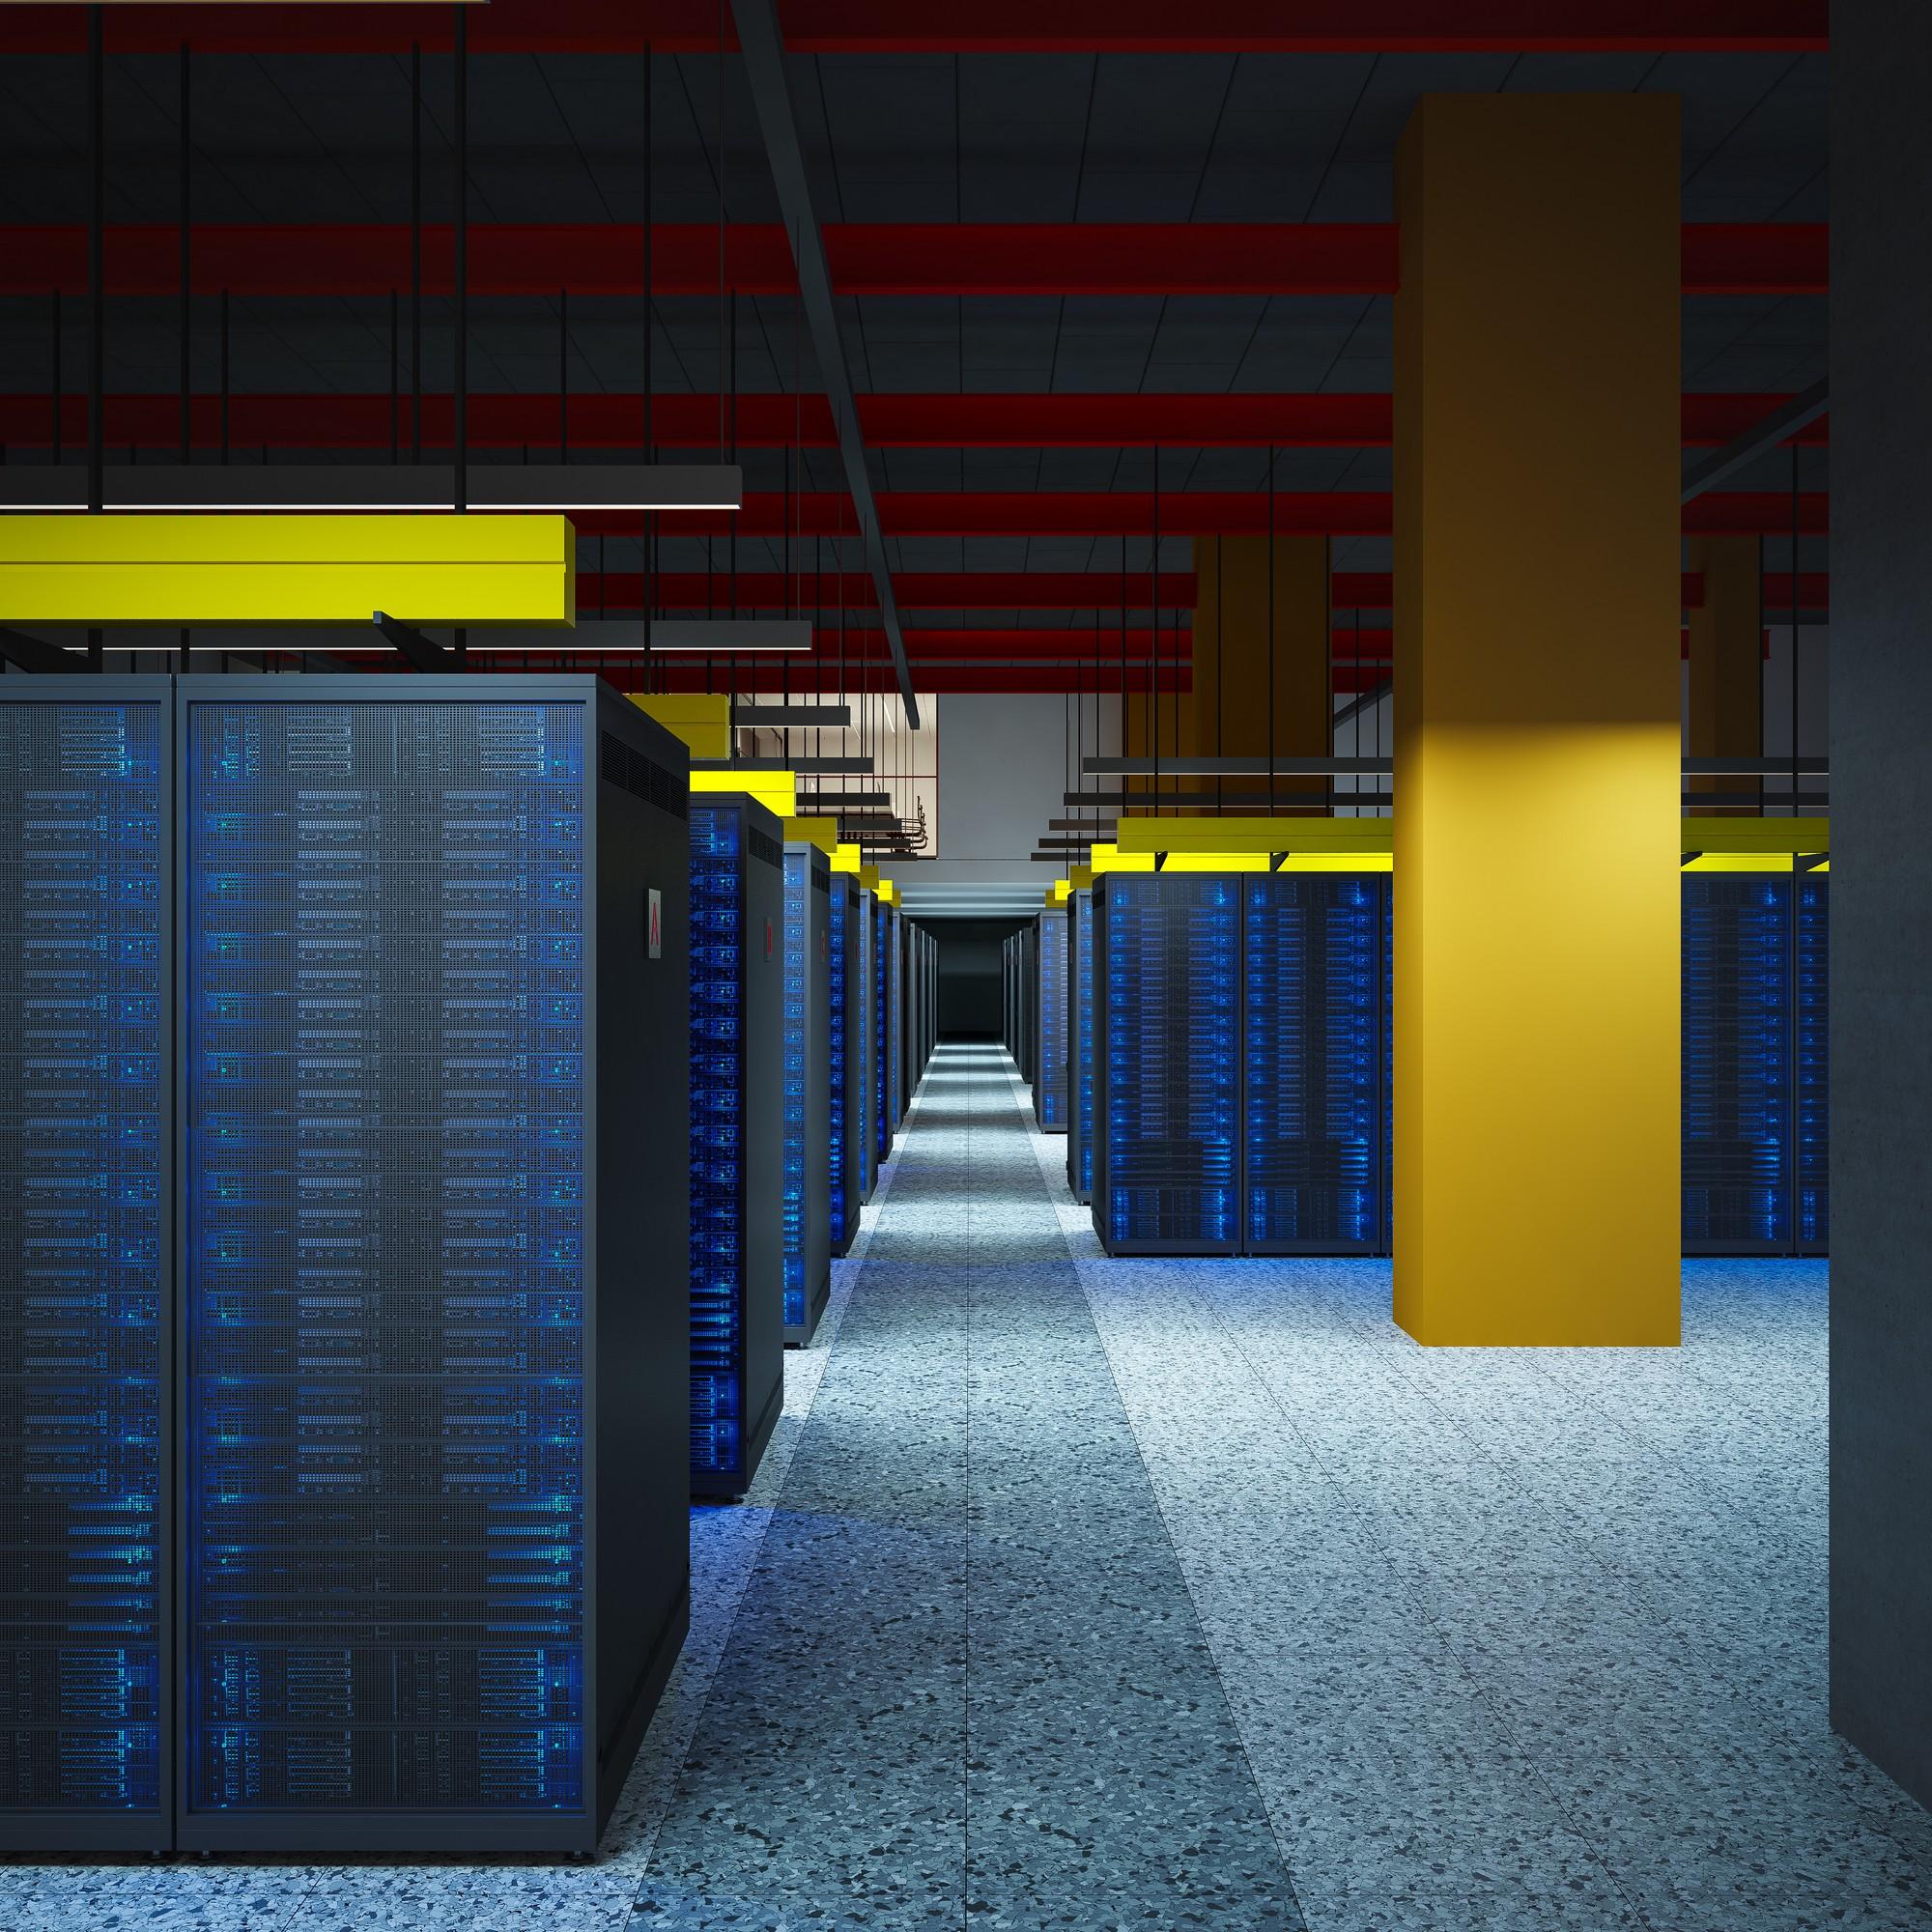 ServersDone